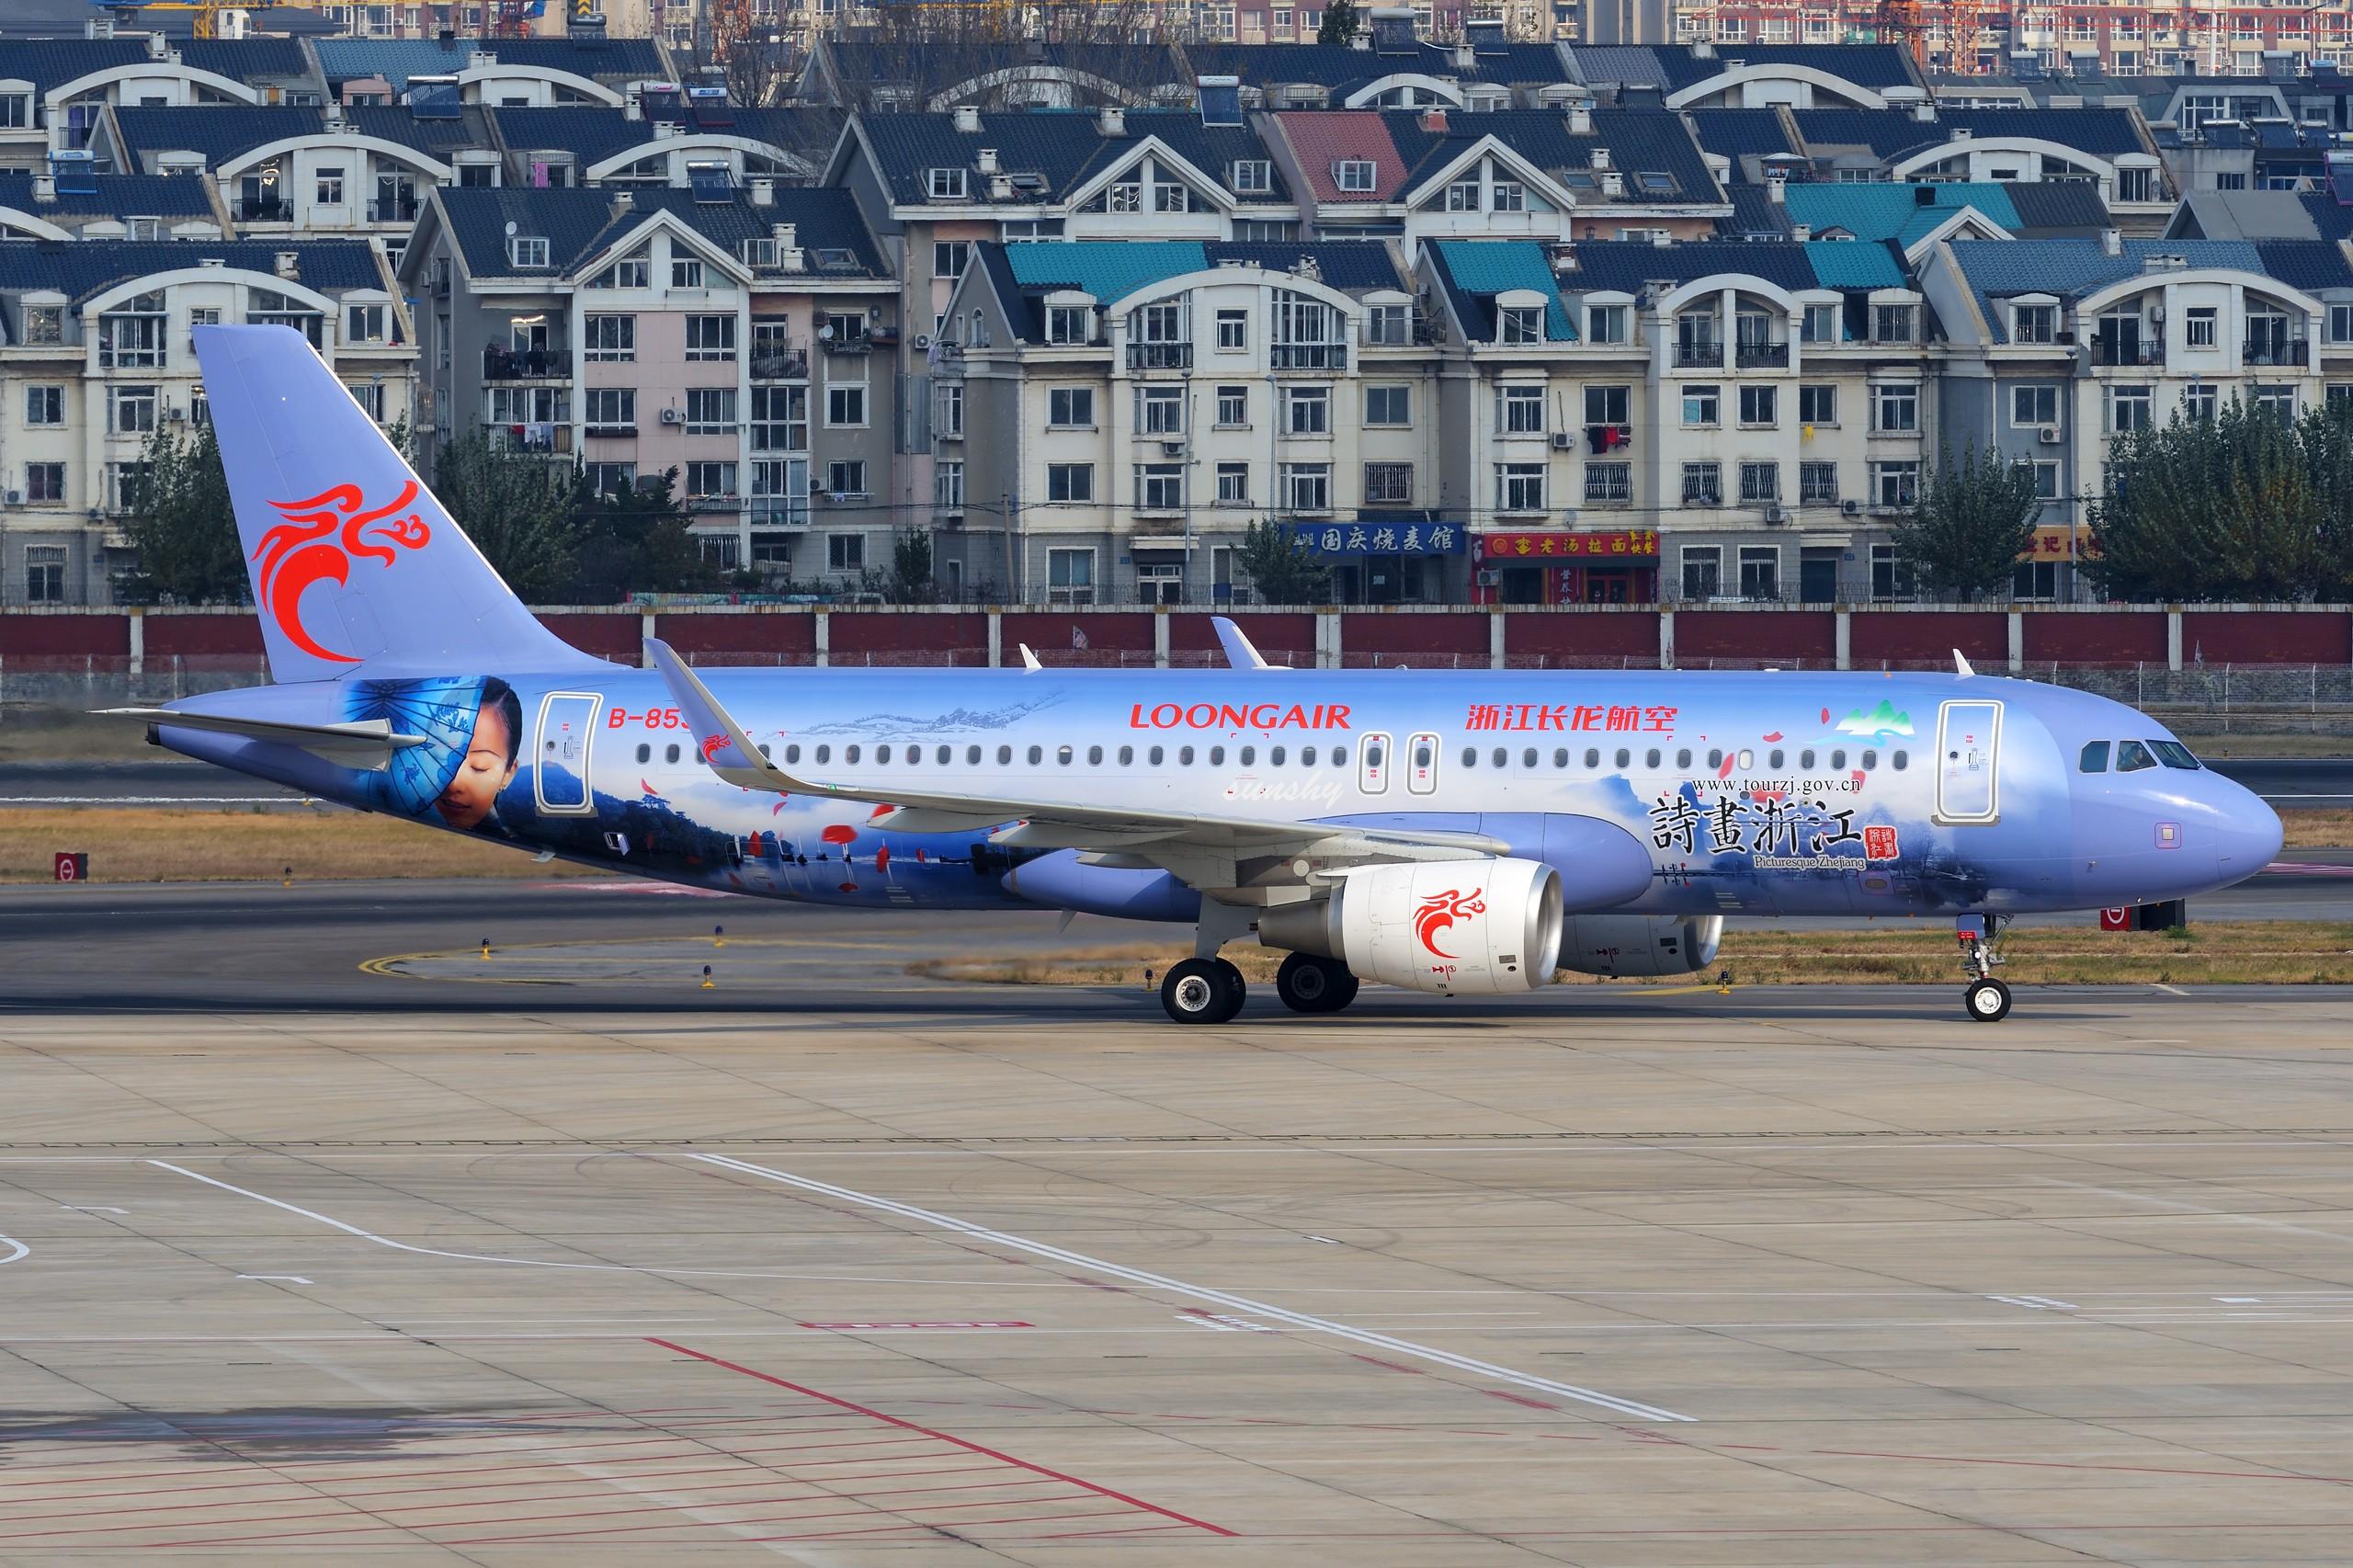 Re:[原创]★[DLC]一点有趣的事情(2560pix走起)★ AIRBUS A320-200 B-8593 中国大连国际机场